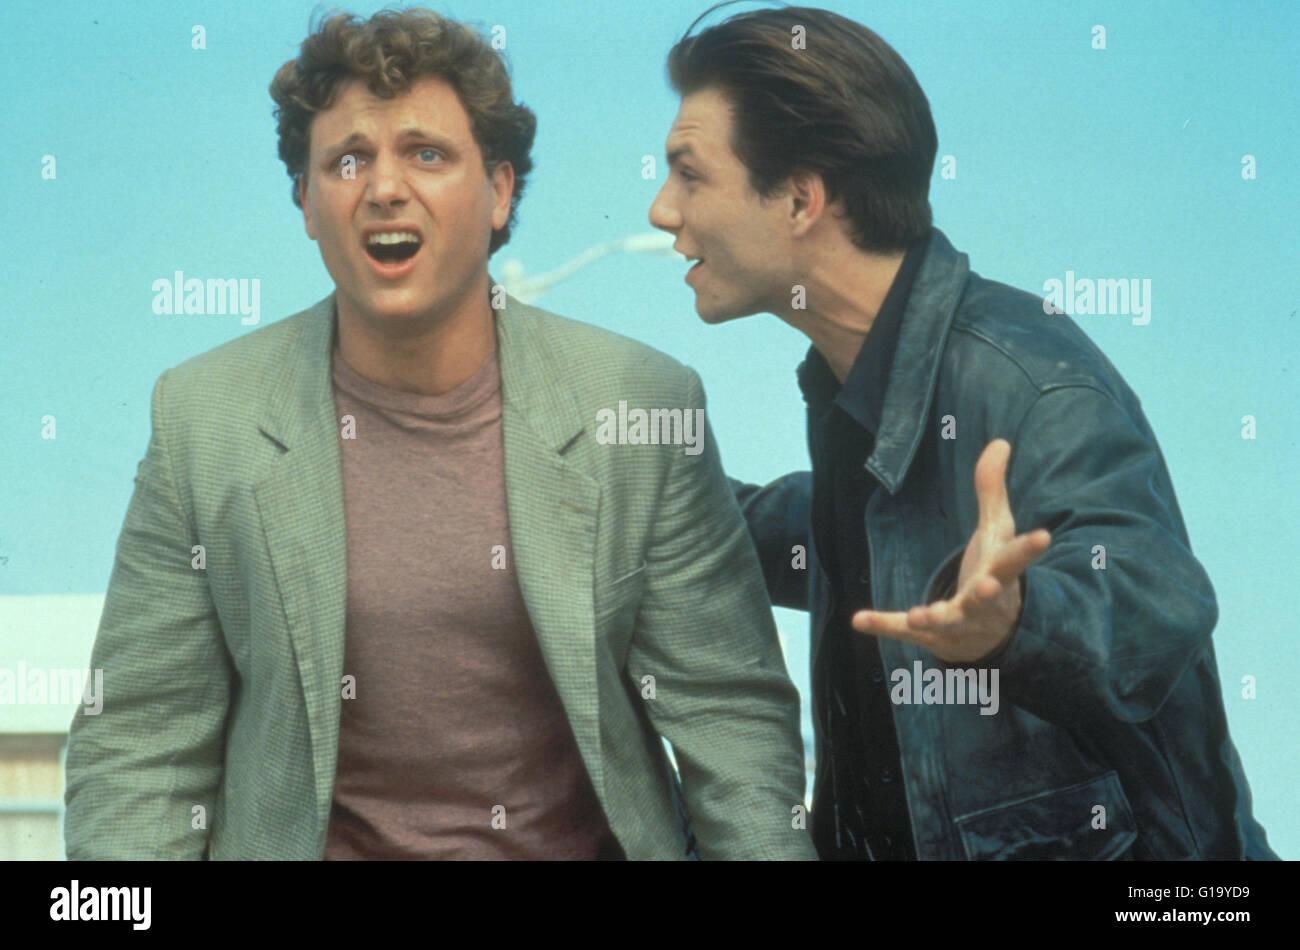 Kuffs - Ein Kerl zum Schießen / Tony Goldwyn / Christian Slater - Stock Image